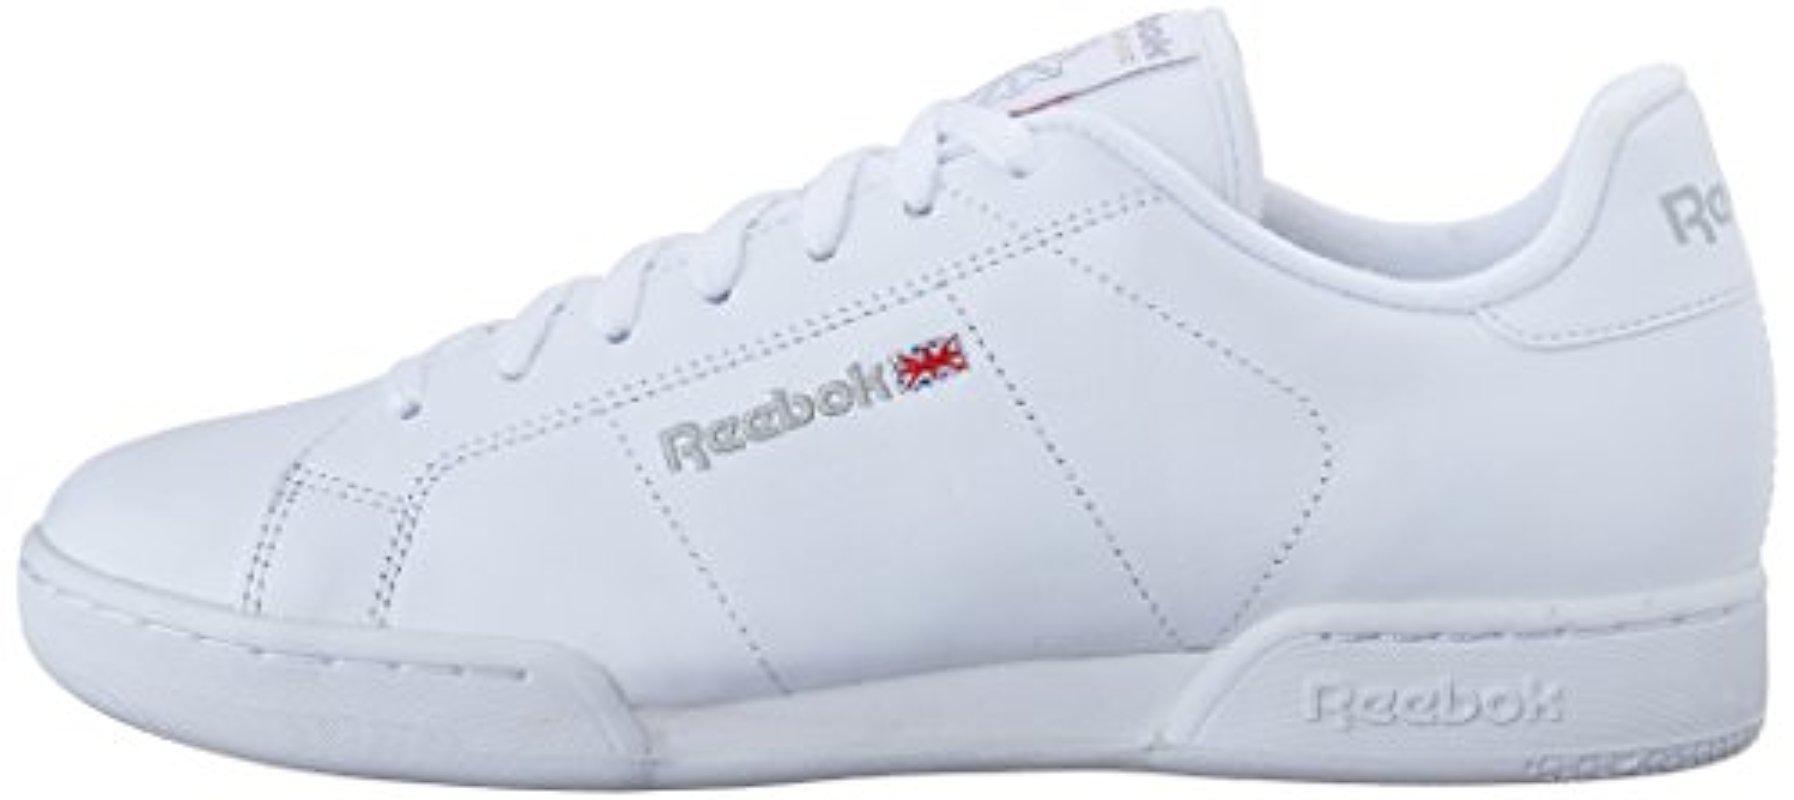 Reebok Leather 's Npc Ii Low-top